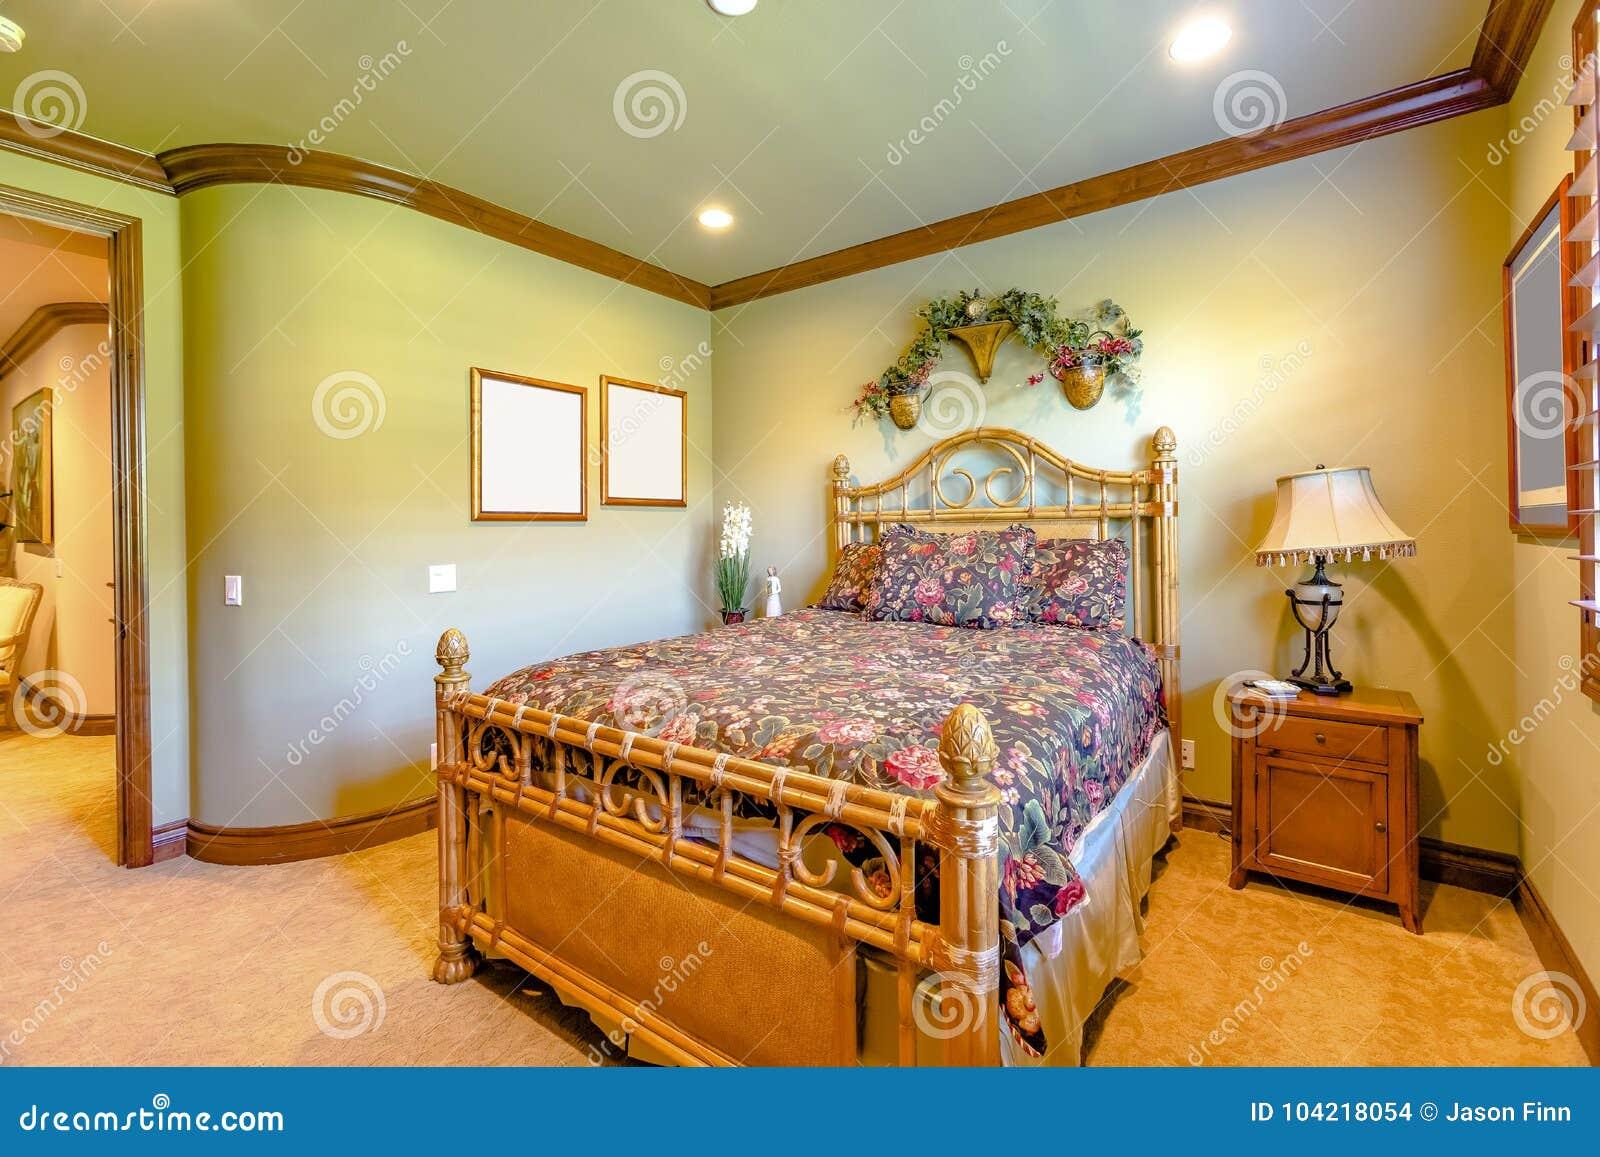 Thumbs Dreamstime Com Z Luxury Bedroom California